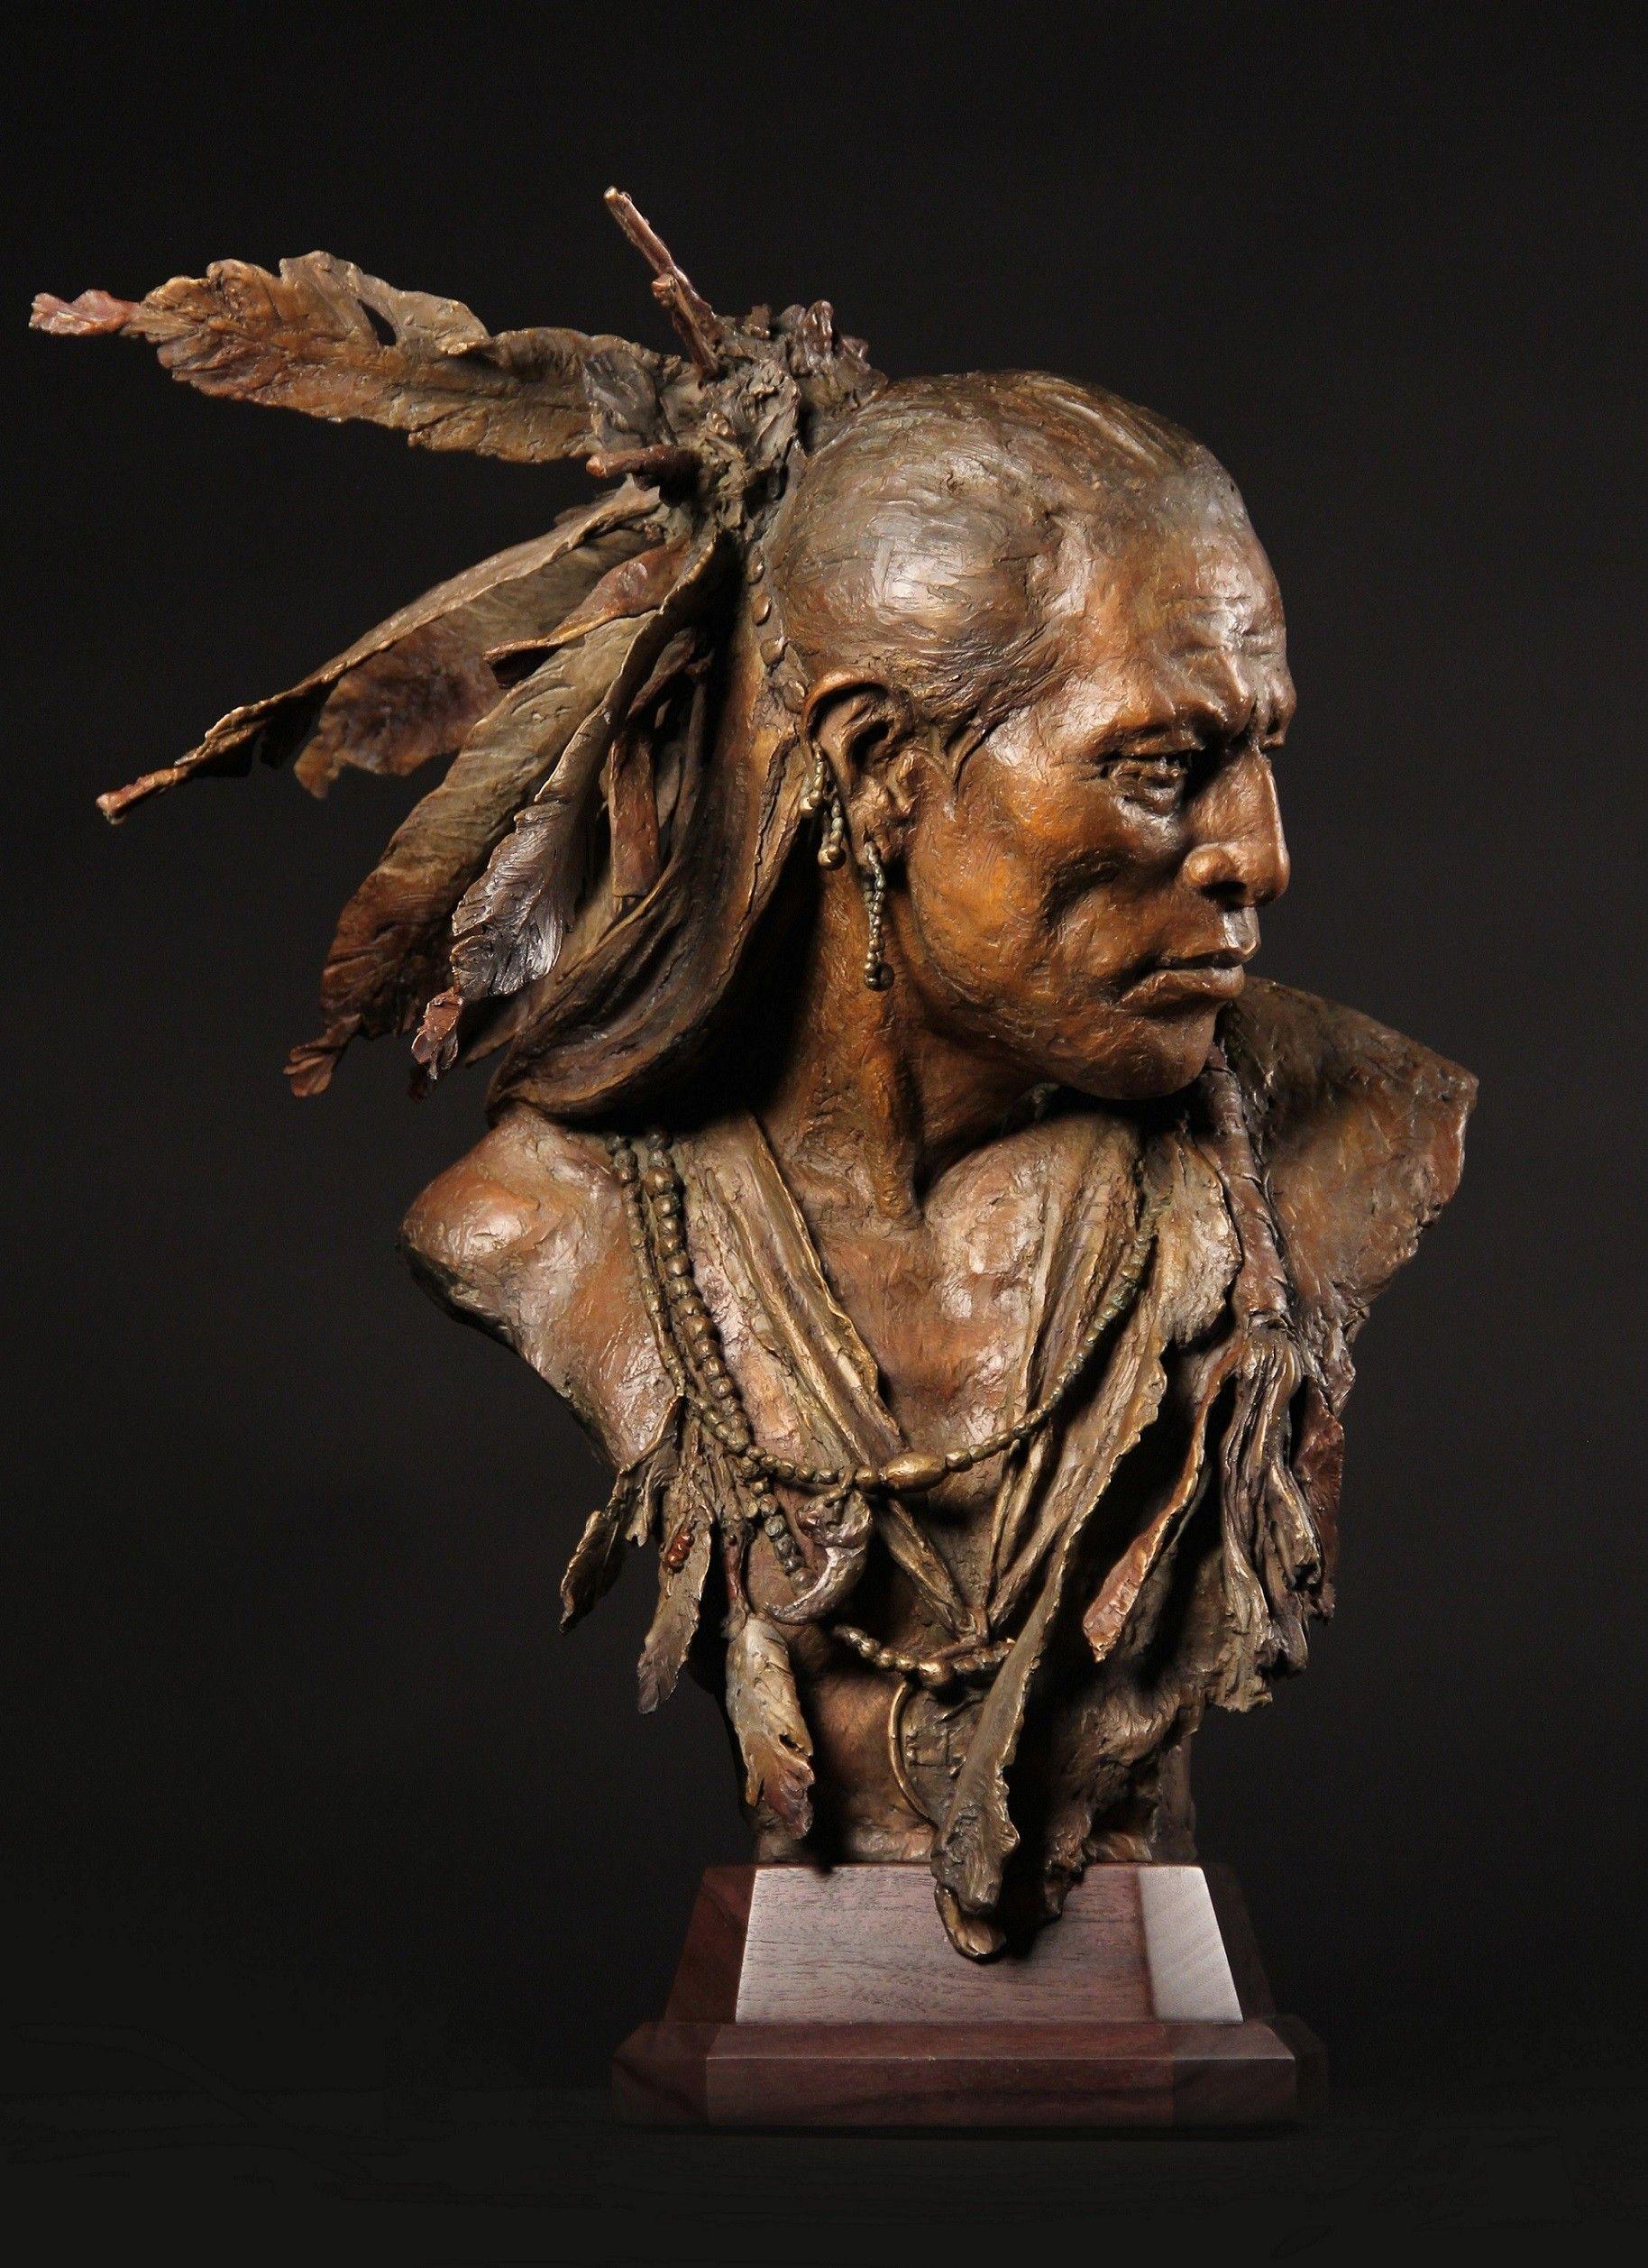 John coleman ca artist bronze sculpture paintings